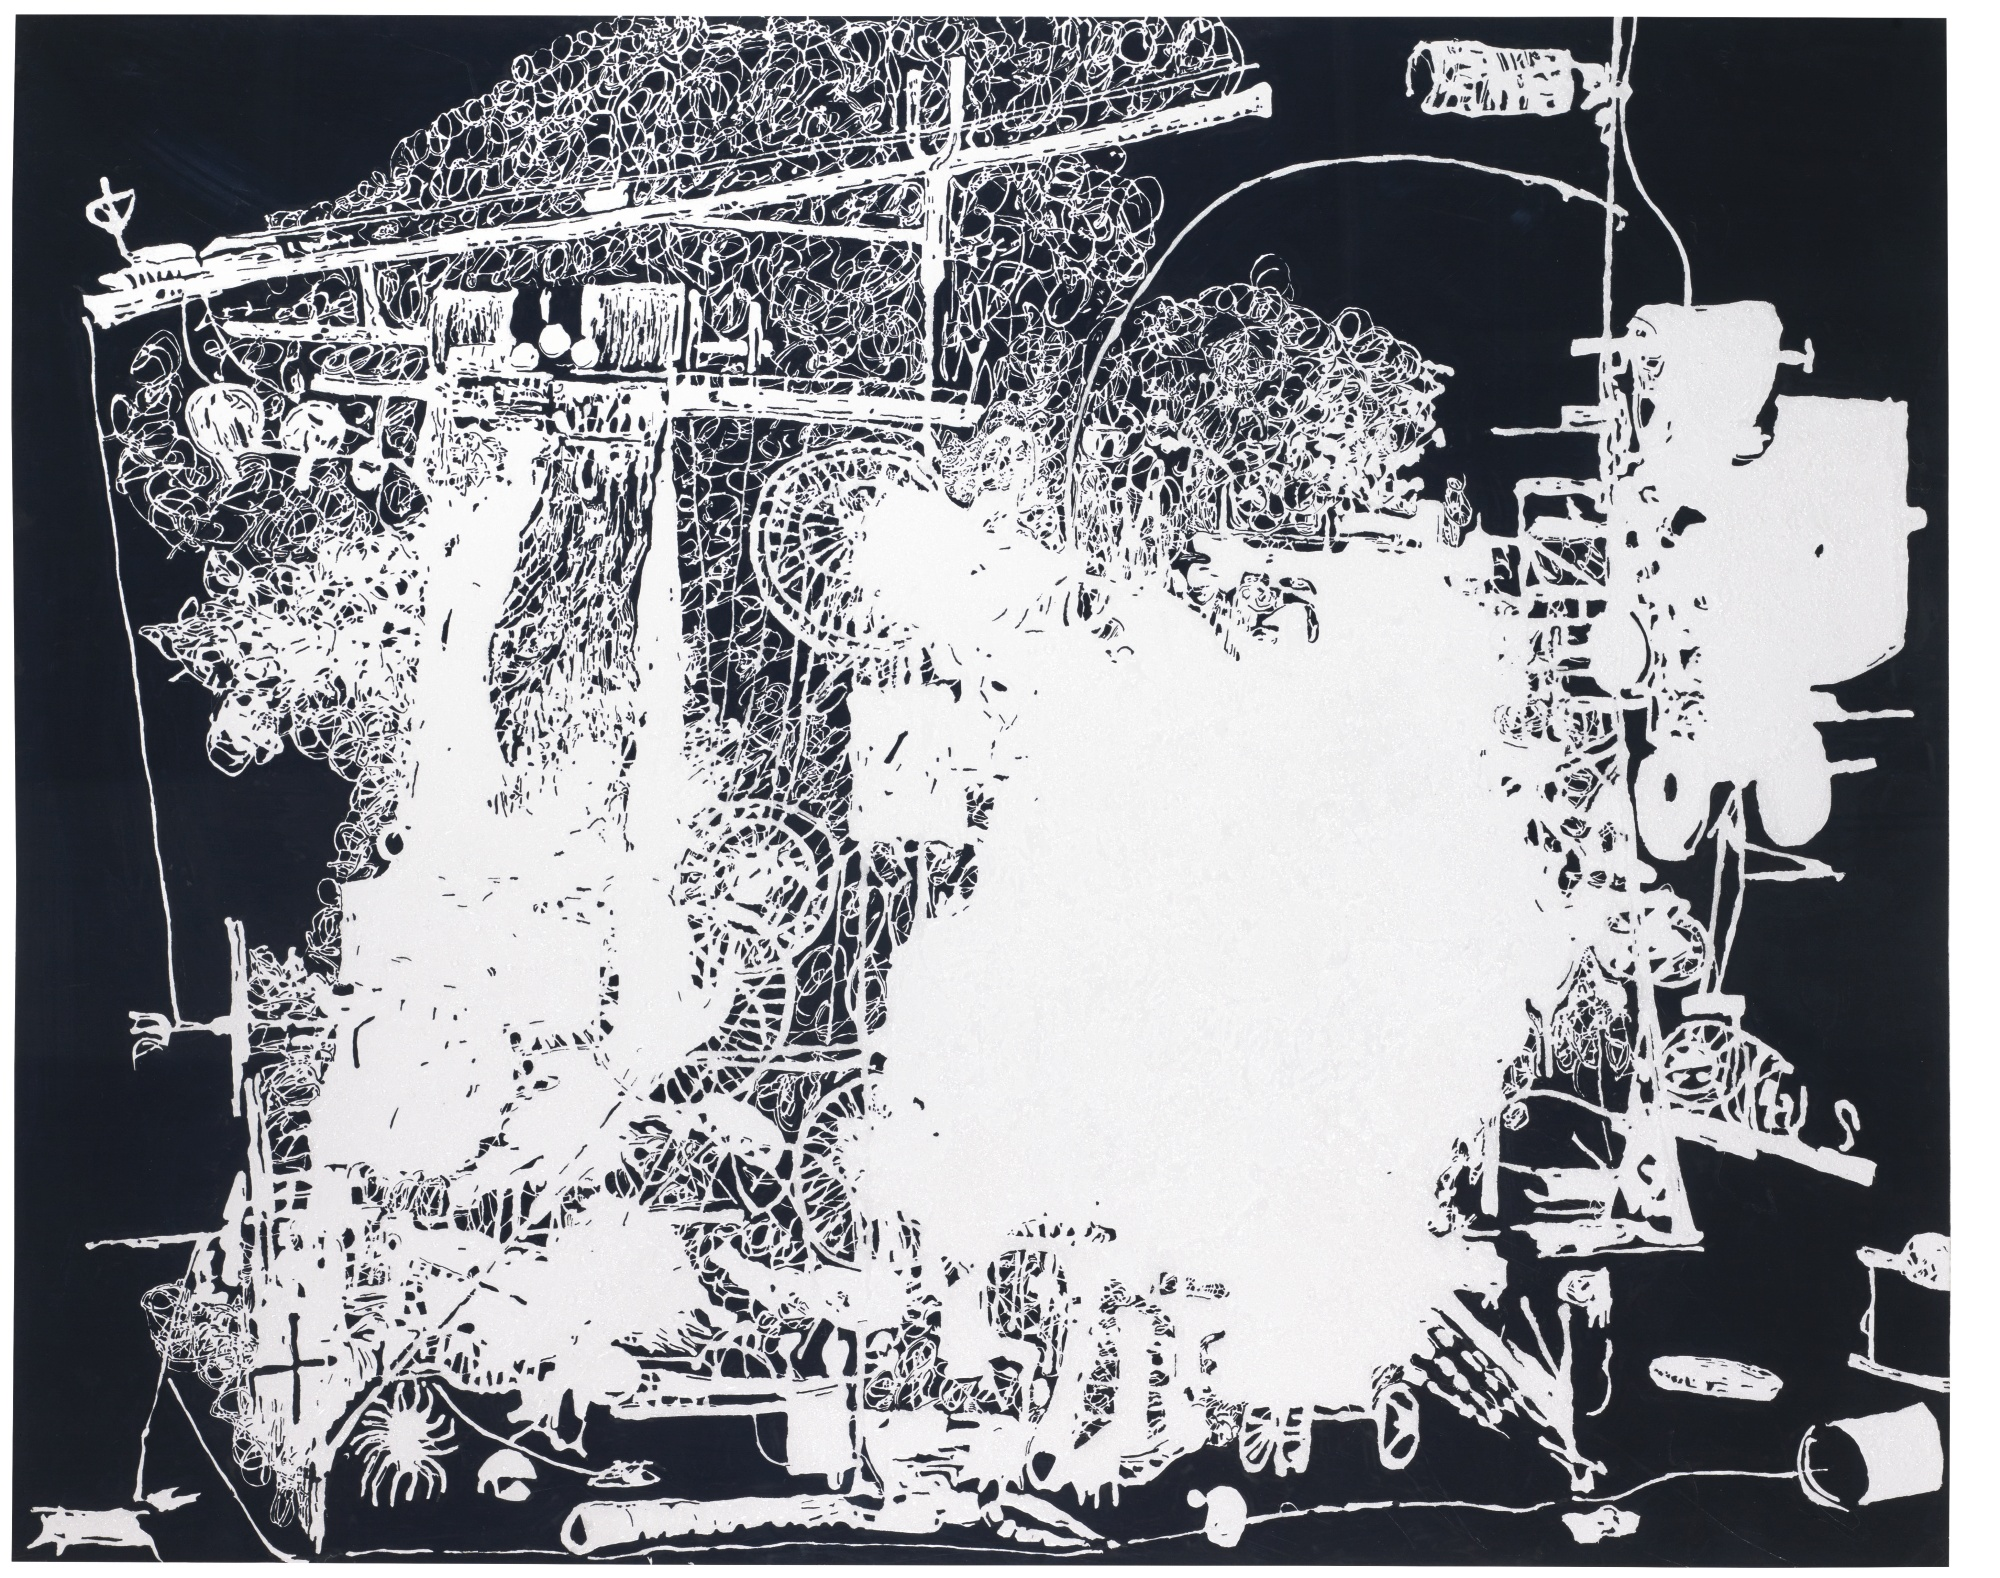 Michael Landy-H.2.N.Y. Self-Mutilating Machine-2006